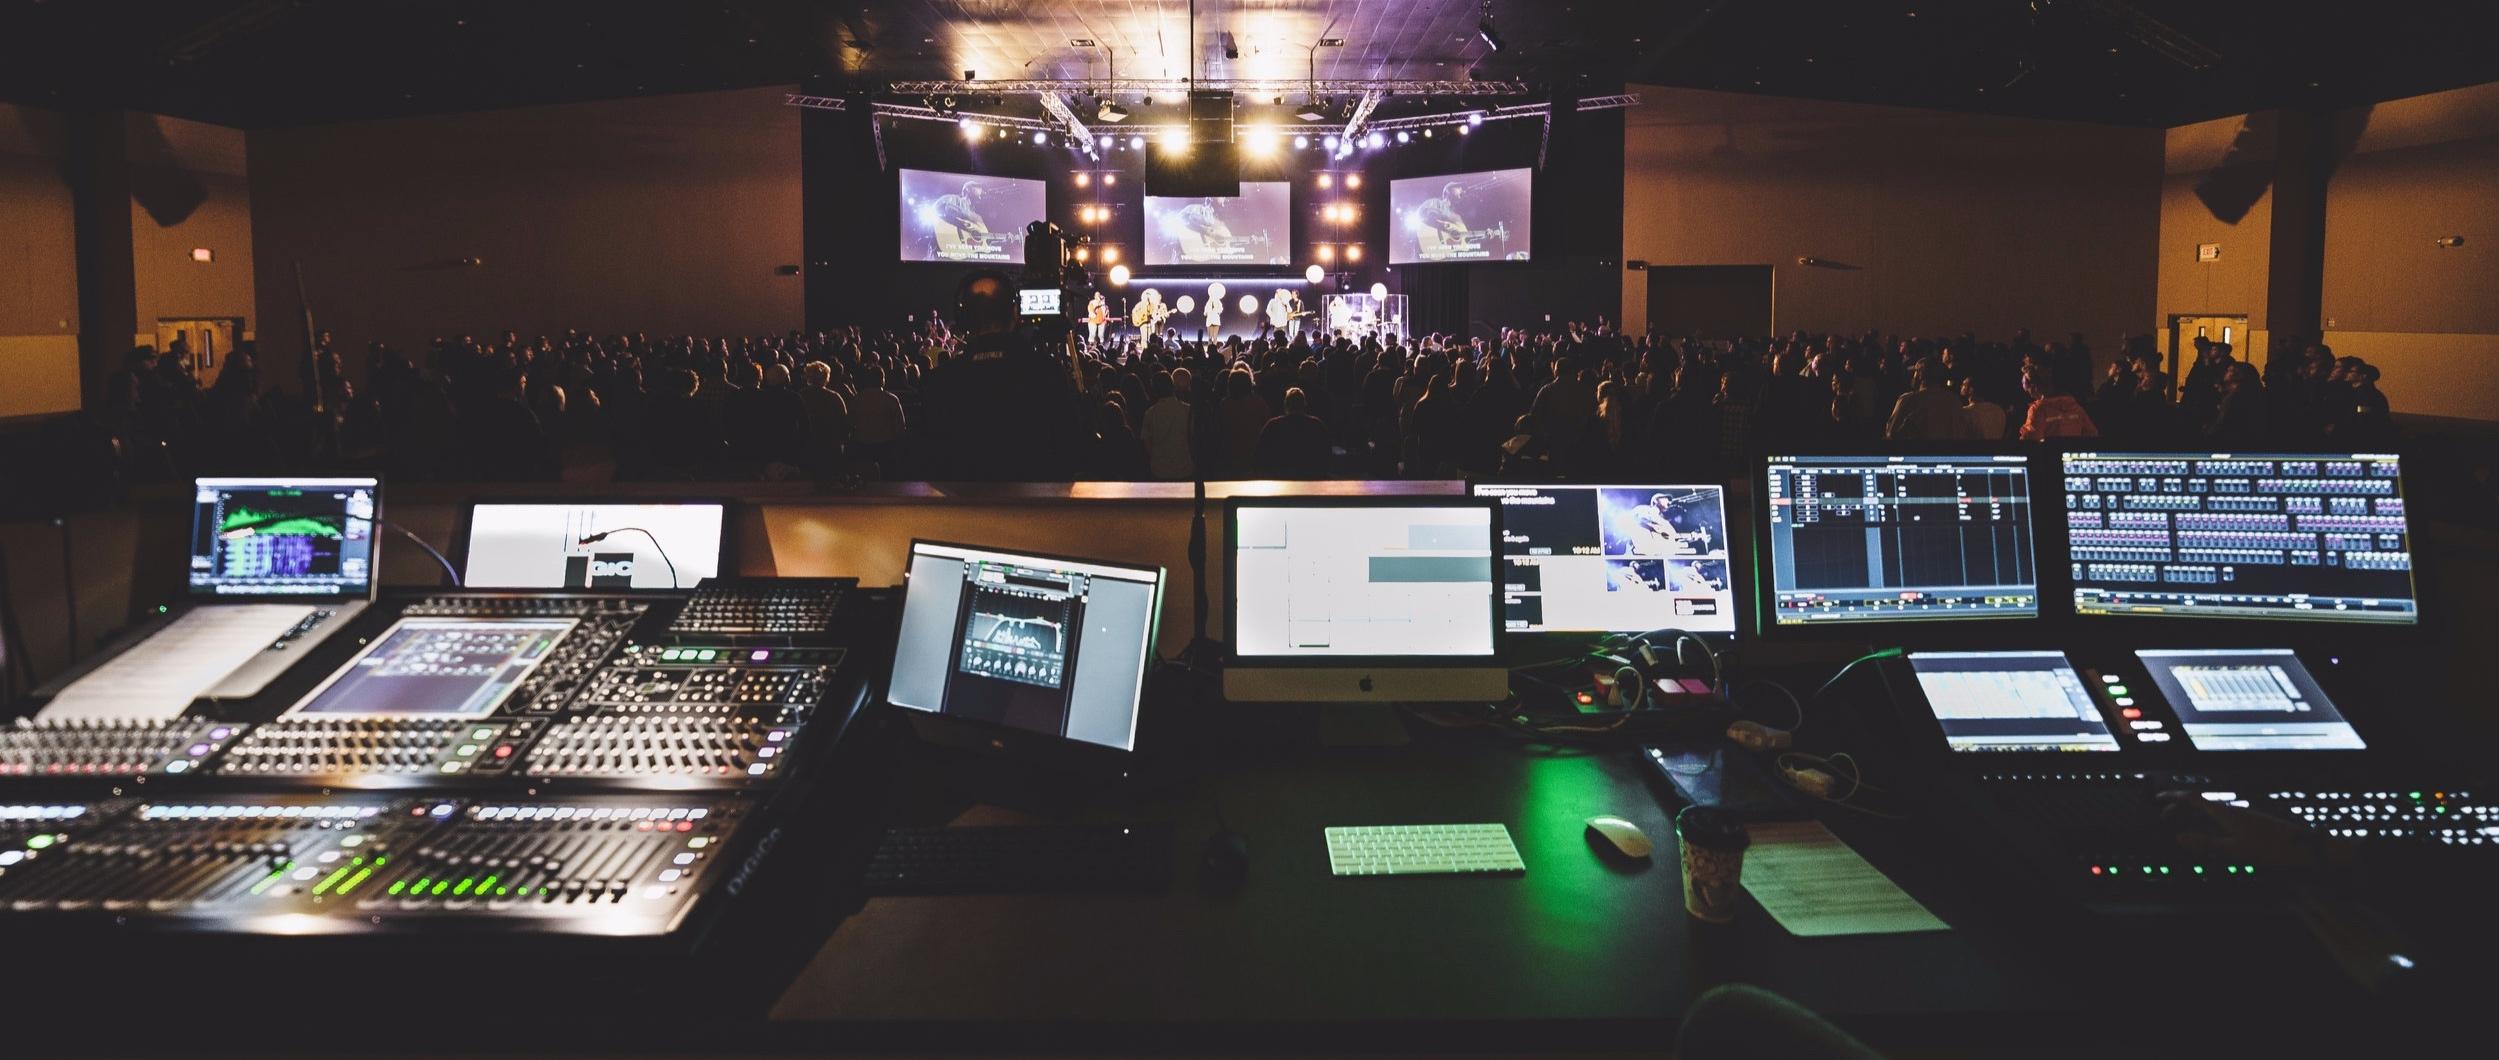 c3 Church: - The digital world awaits.